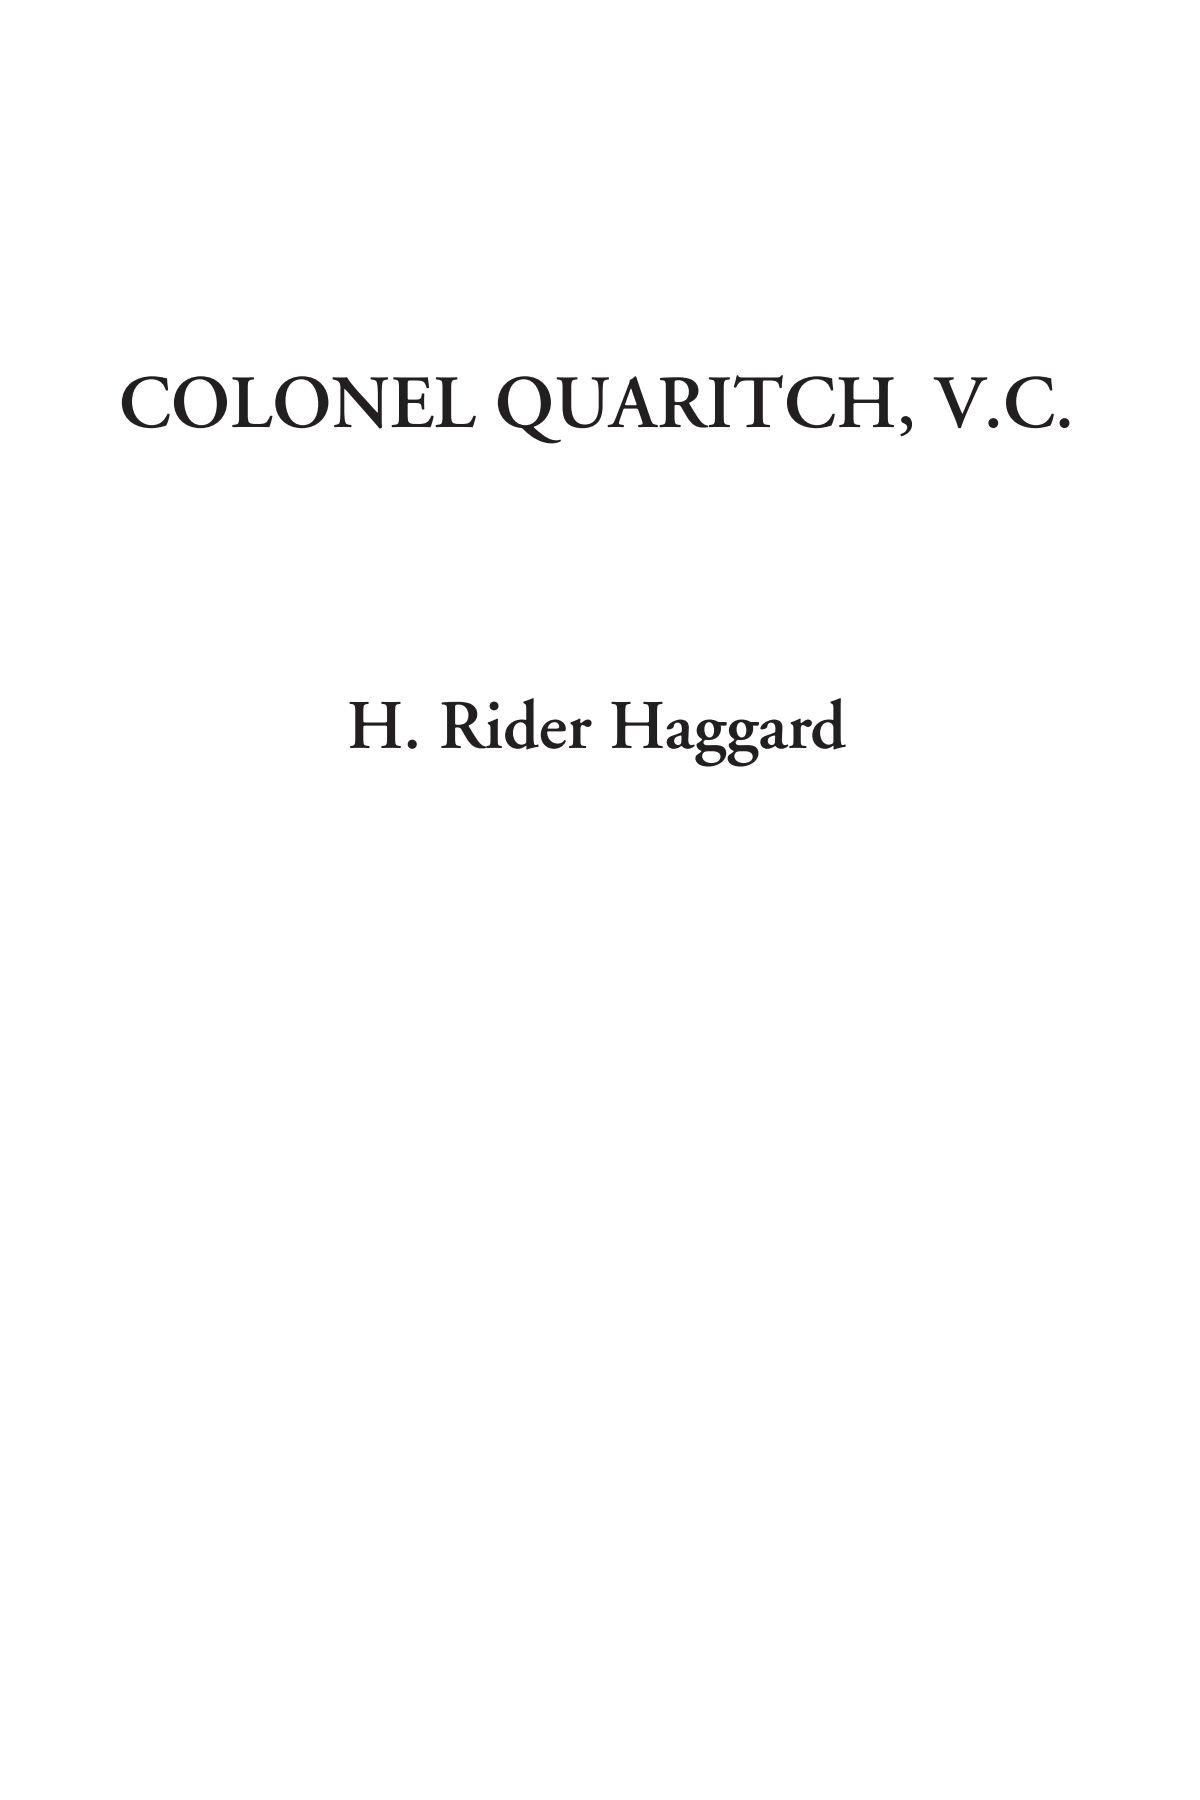 Download Colonel Quaritch, V.C. PDF